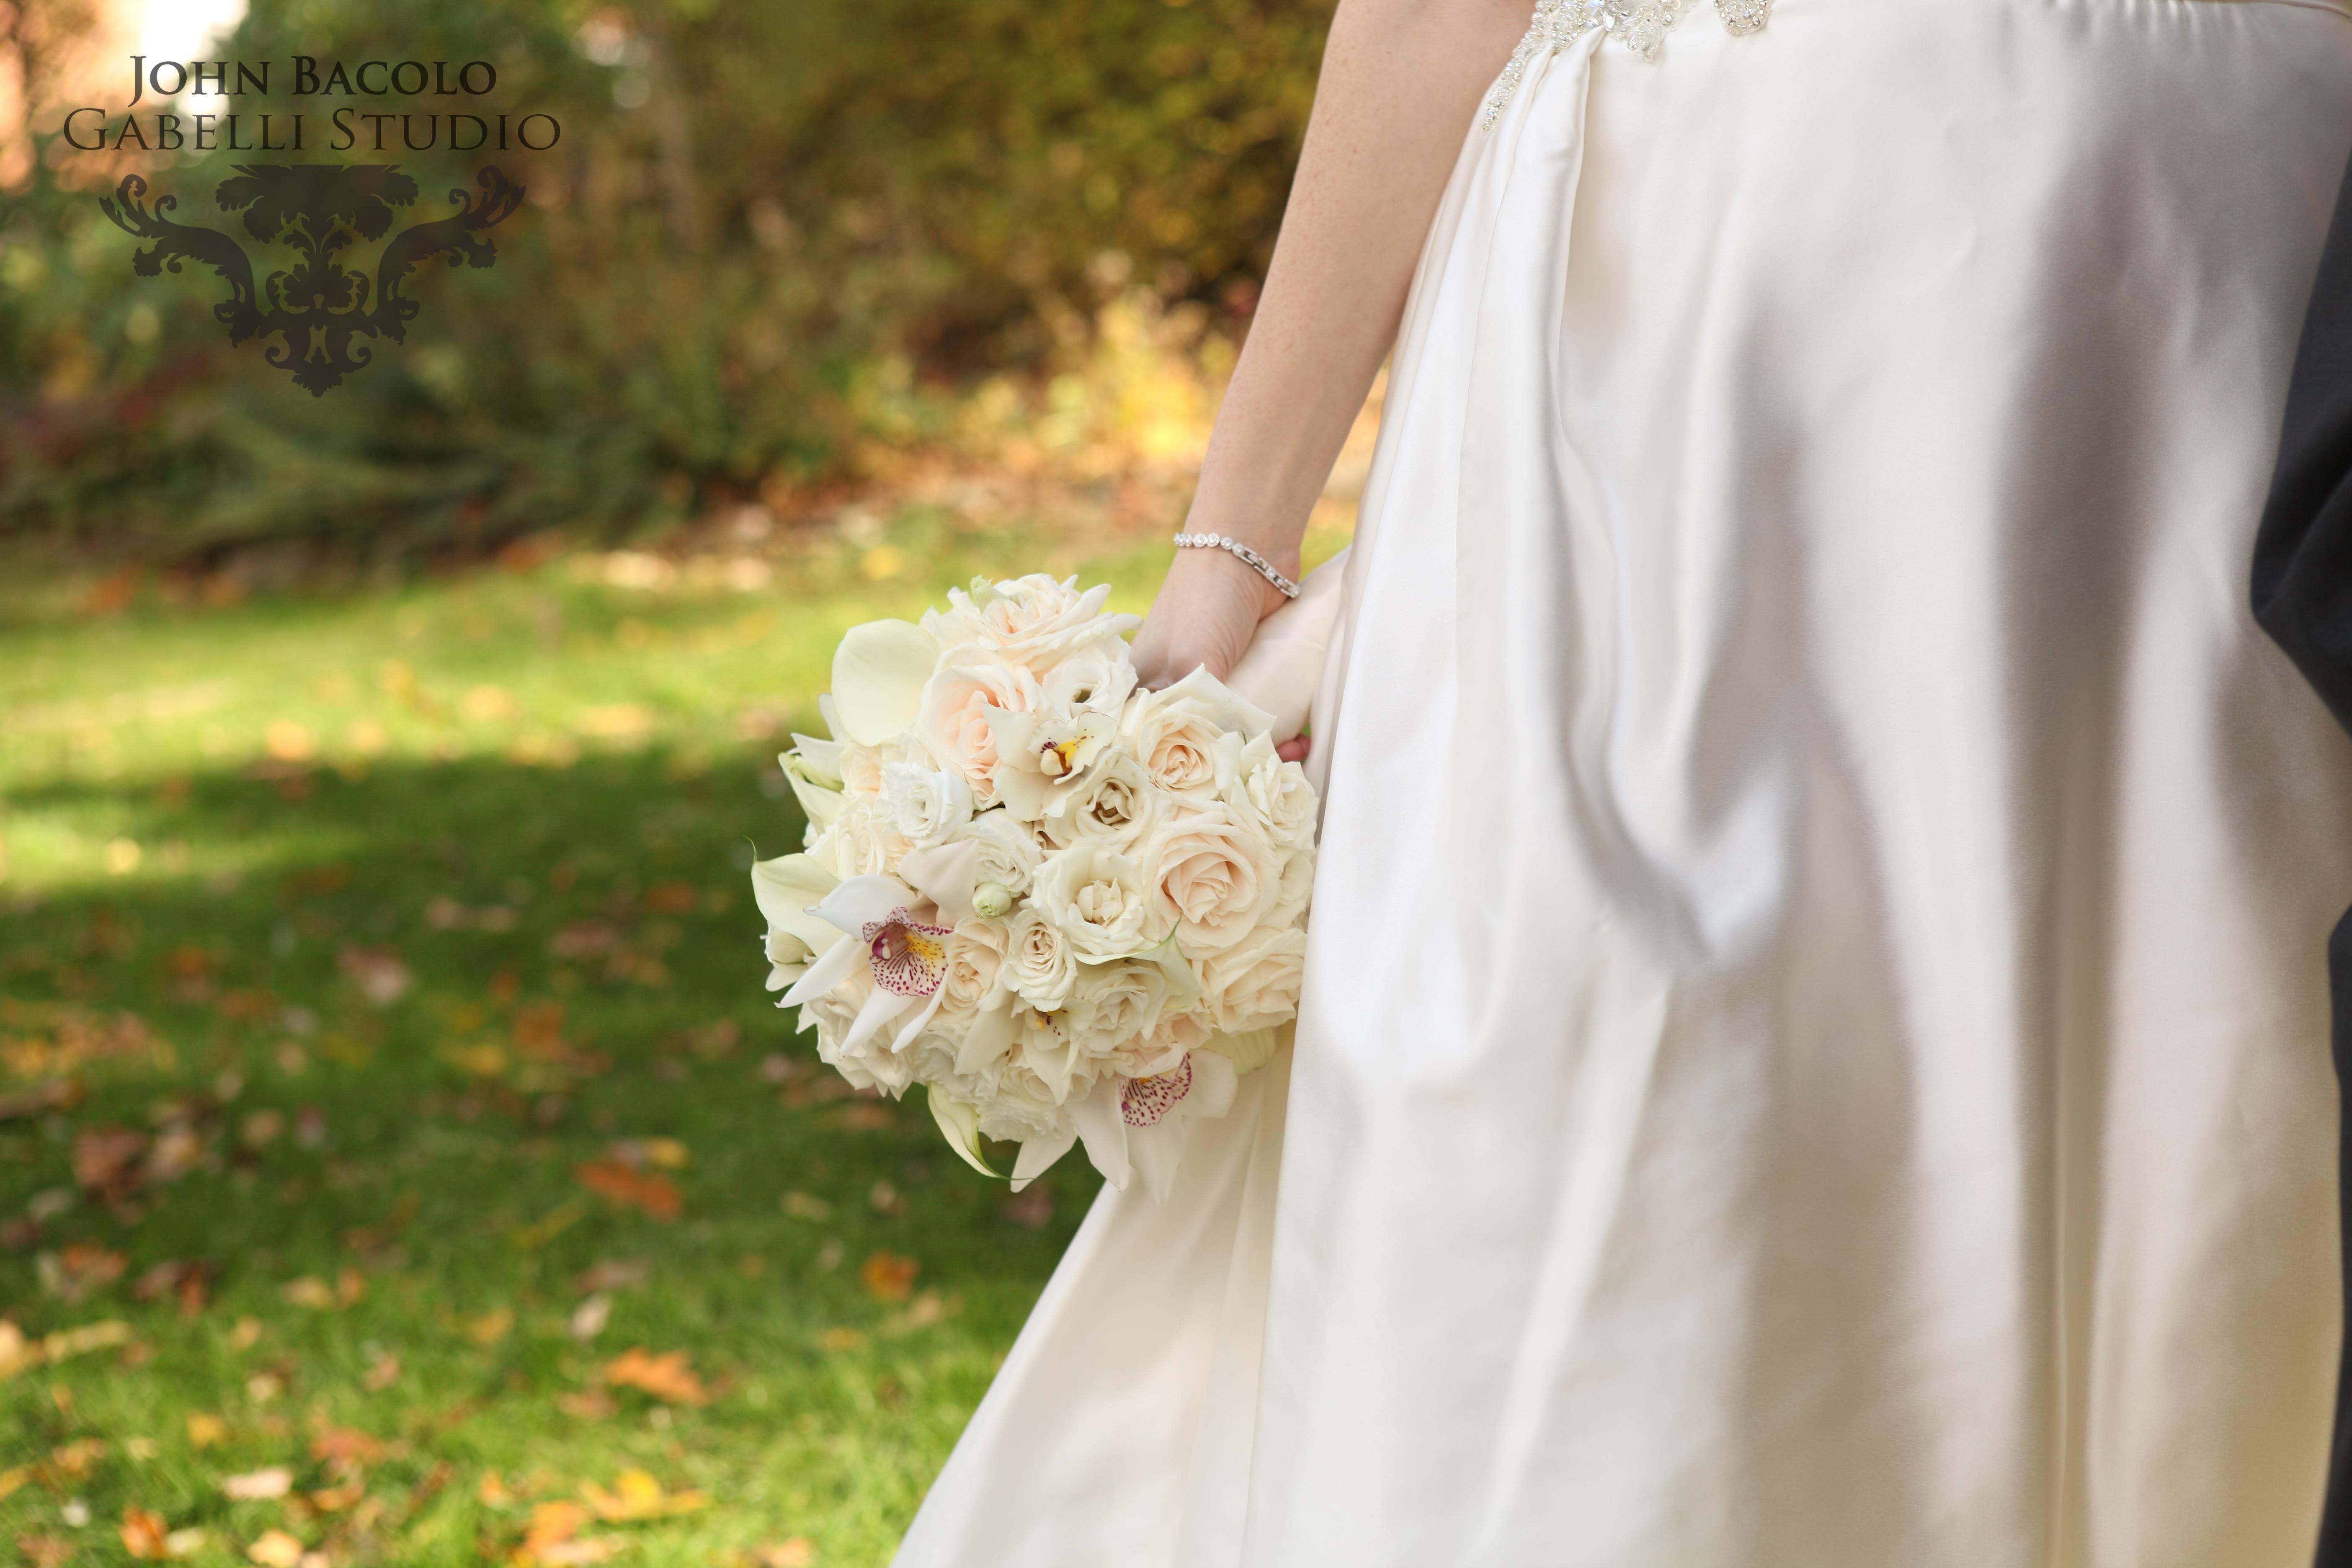 Cream, ivory, white bridal bouquet